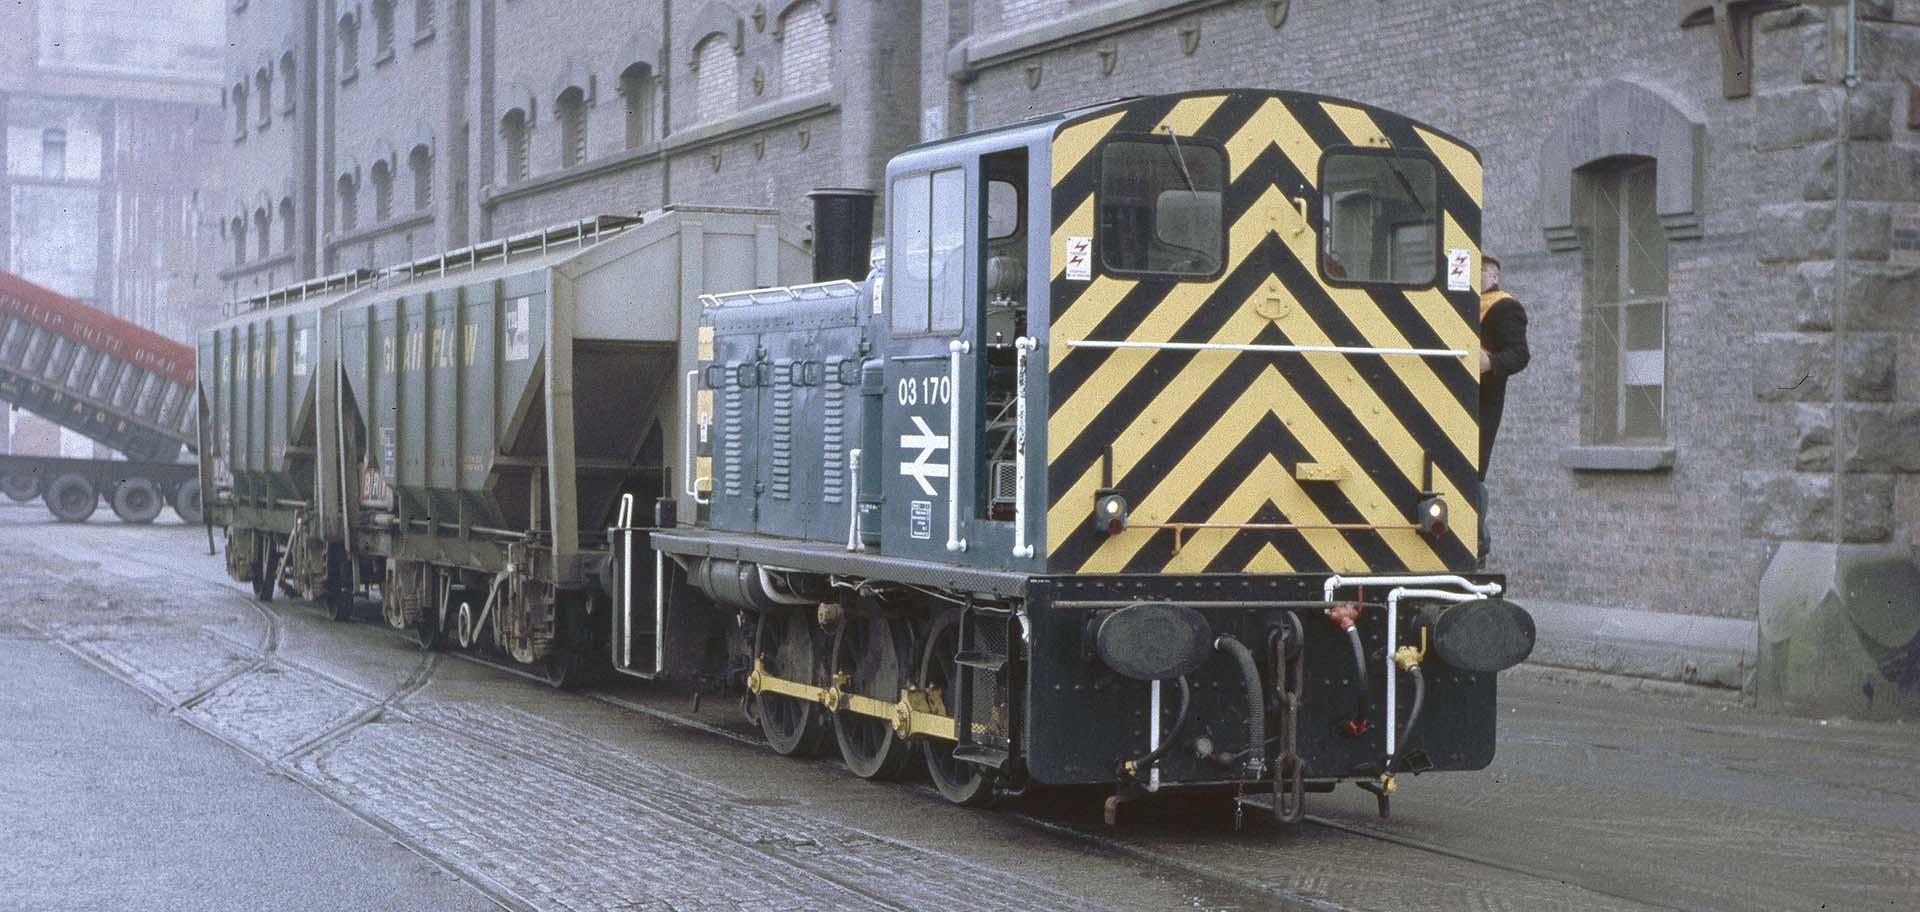 03170 shunts 2 'Covhop wagons' at Birkenhead Docks in January 1987 © Adrian Nicholls